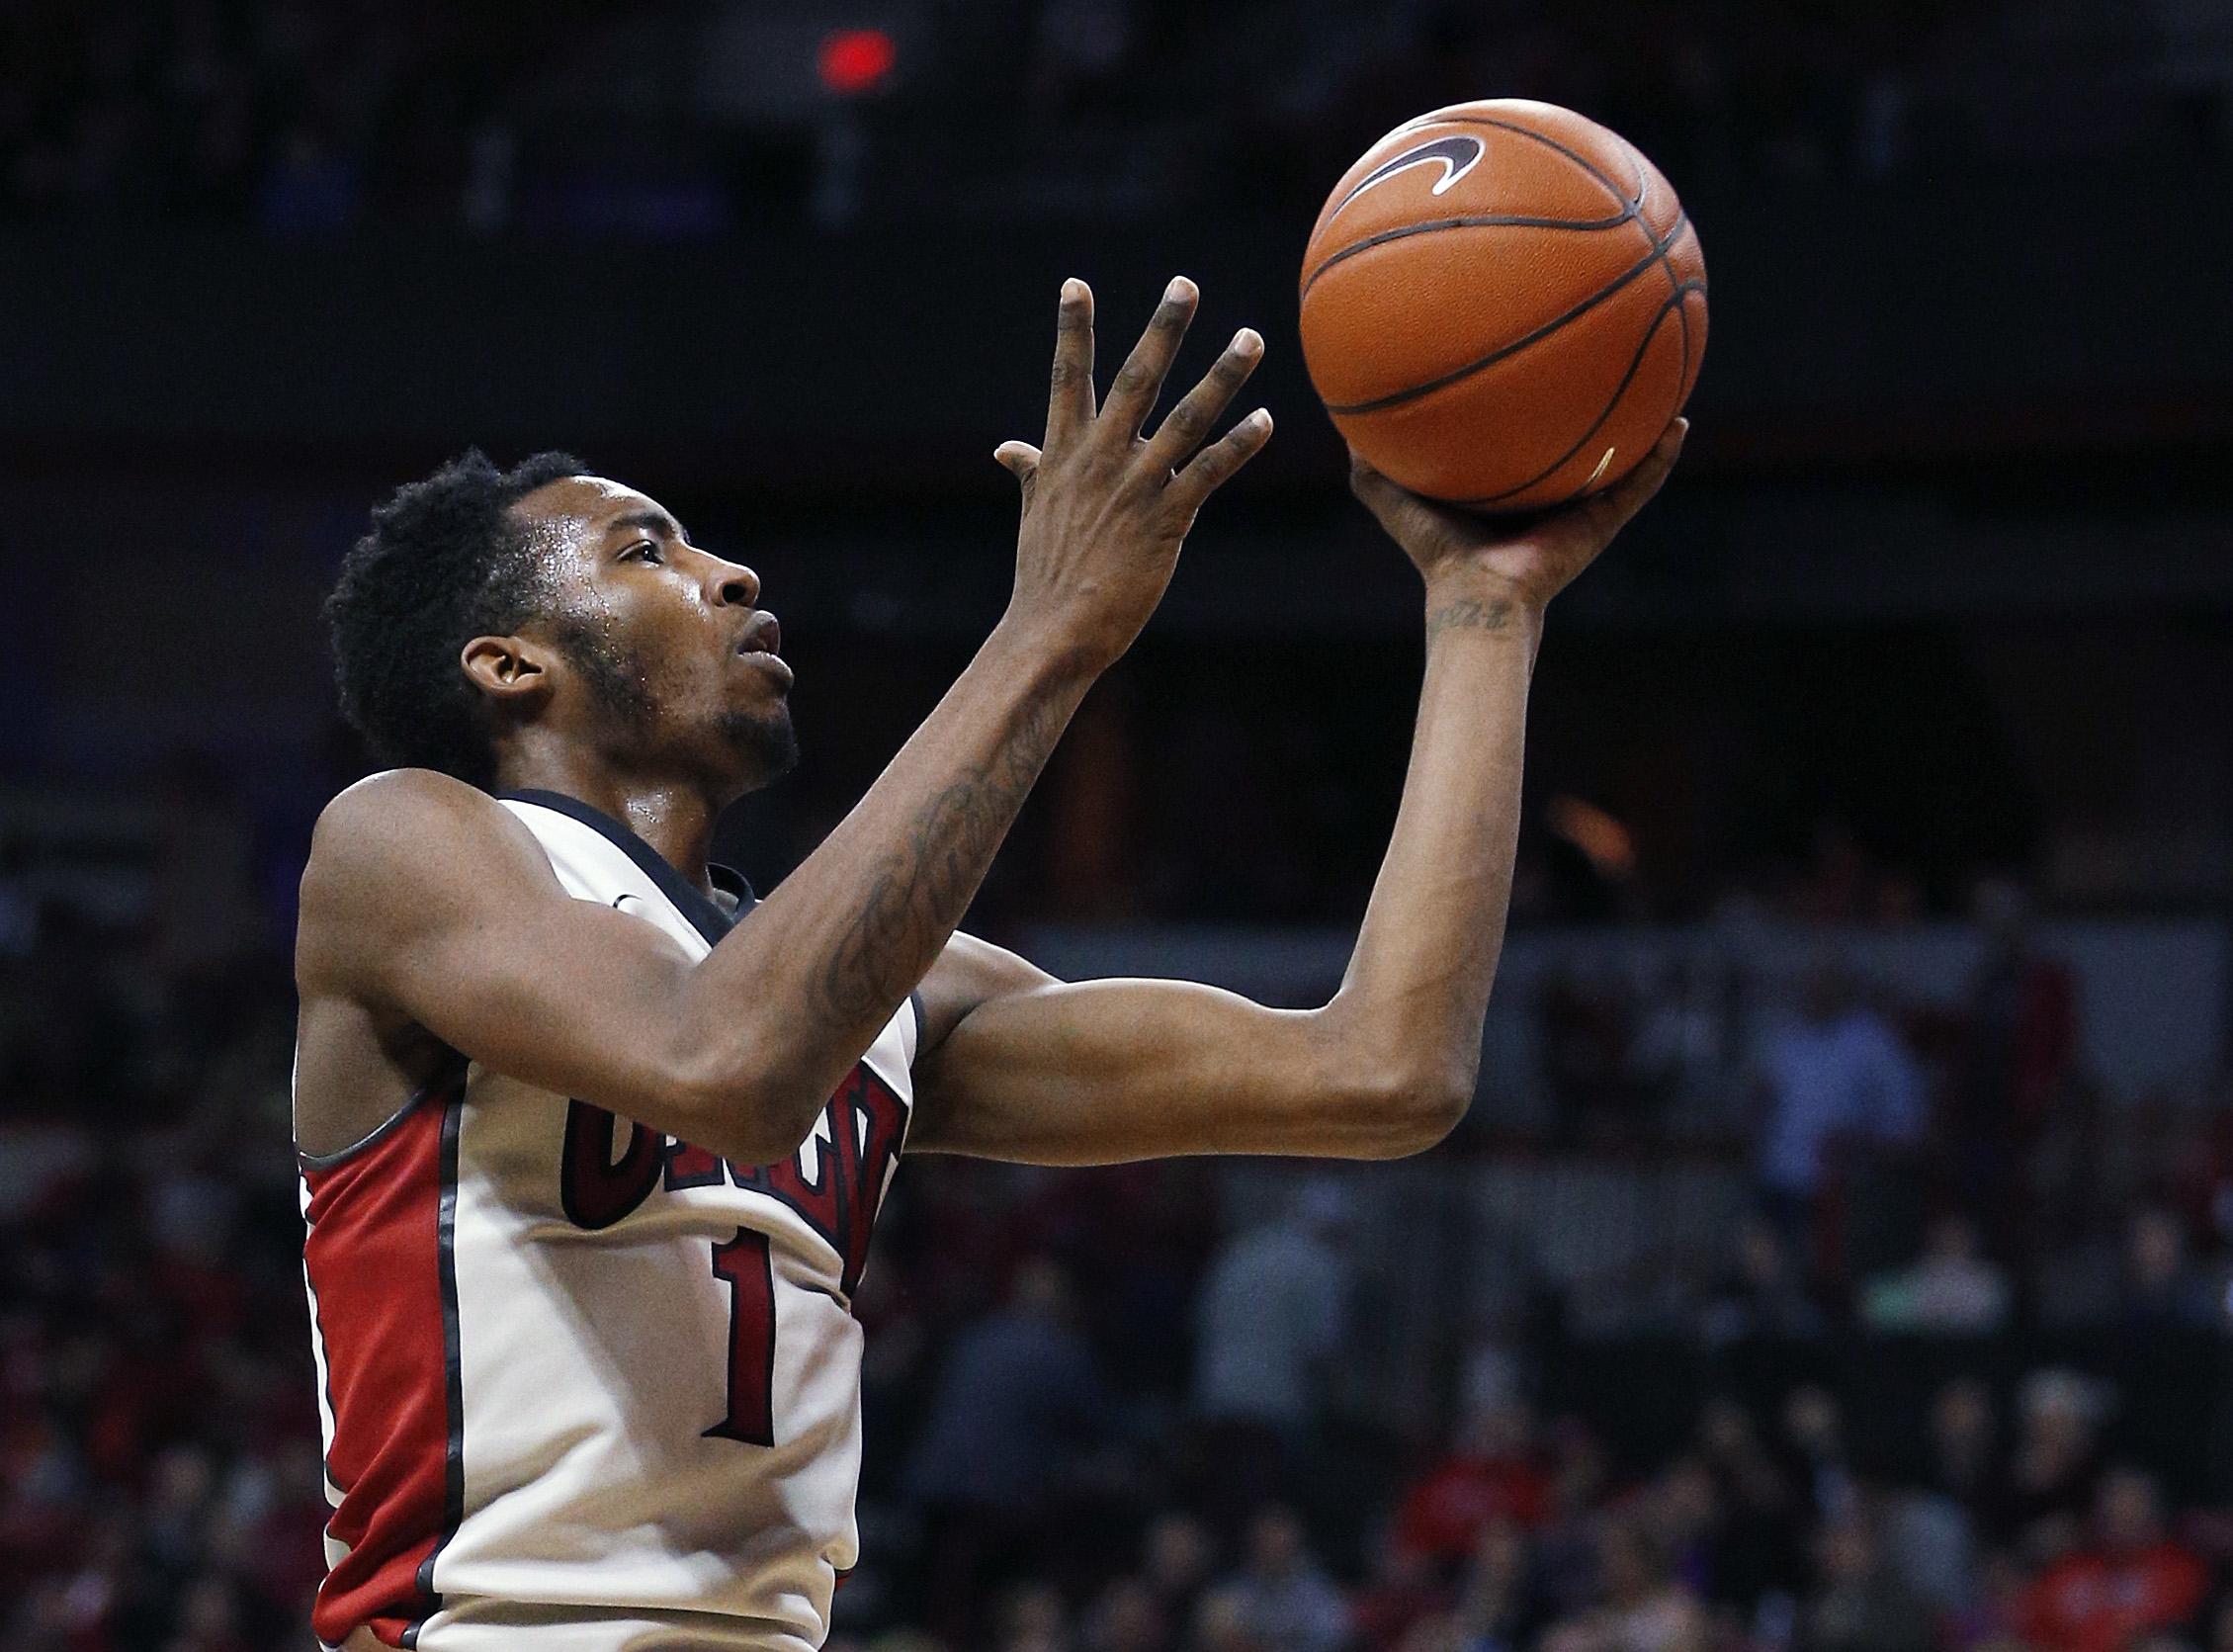 UNLV forward Derrick Jones Jr. shoots against Air Force during the second half of an NCAA college basketball game Saturday, Jan. 16, 2016, in Las Vegas. UNLV won 100-64. (AP Photo/John Locher)